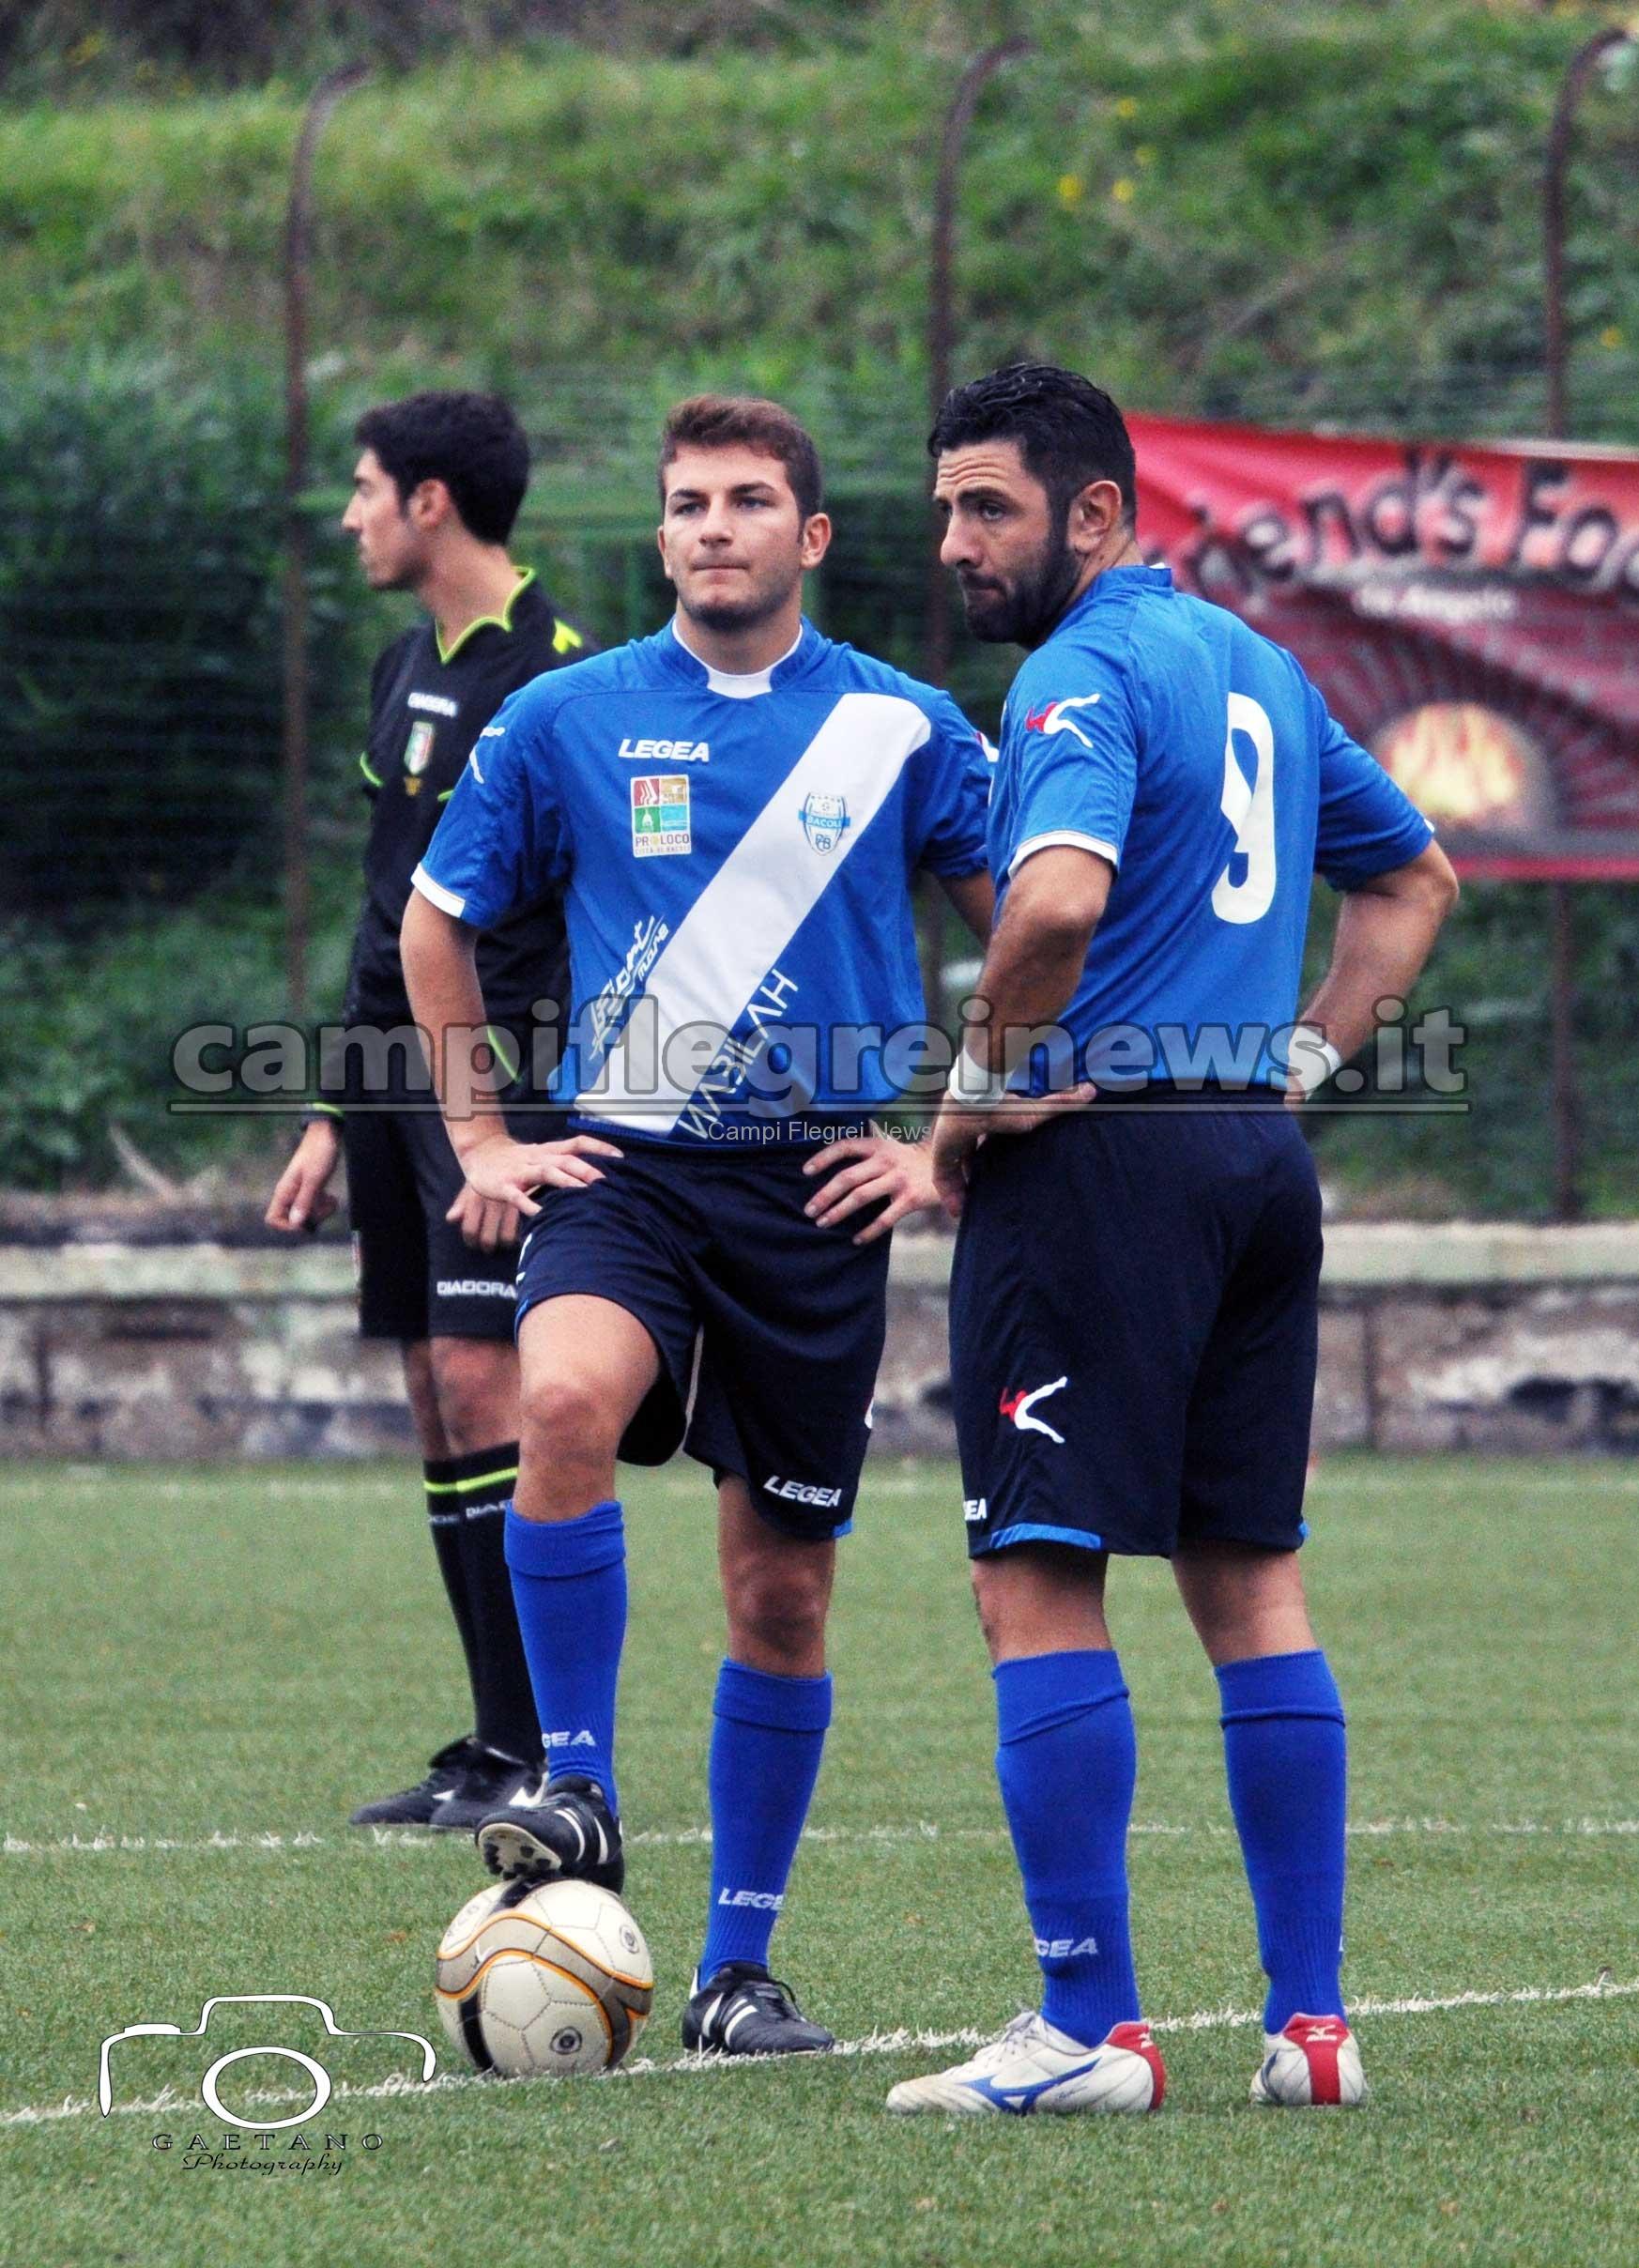 Pro Calcio Bacoli-San Giorgio - 01